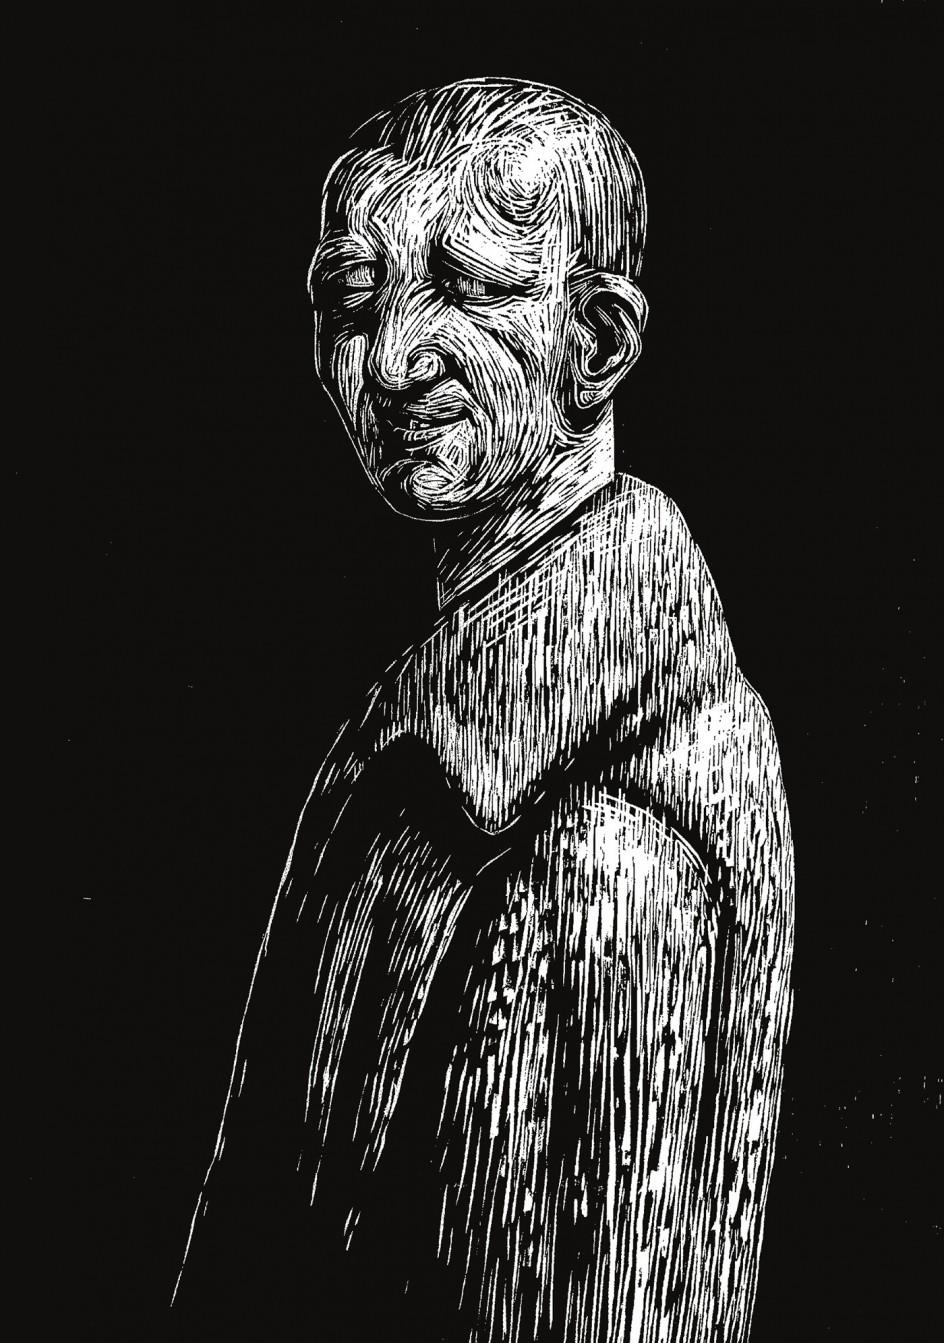 Peter Howson, no title. Grabado del artista escocés Peter Howson